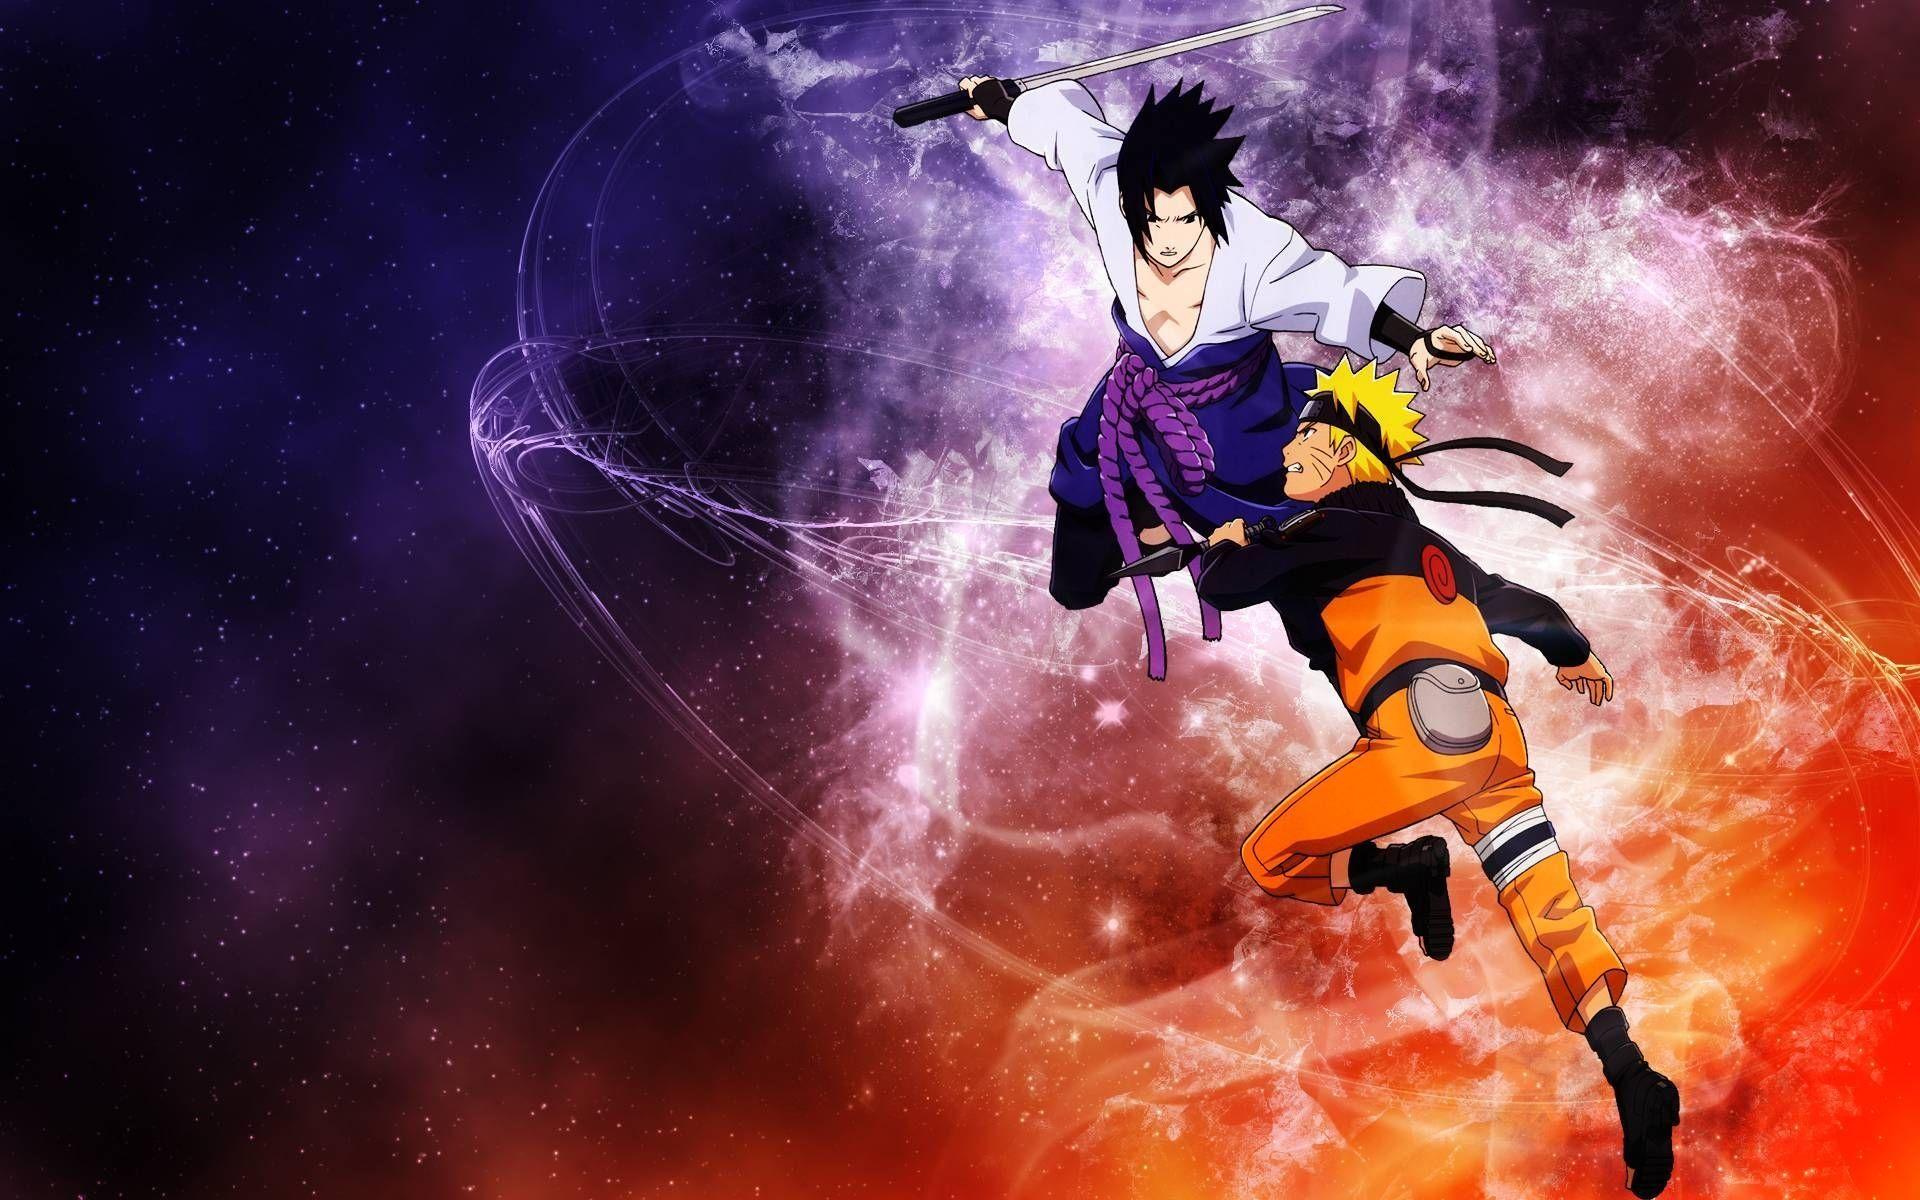 Naruto Wallpaper Hd, Wallpaper